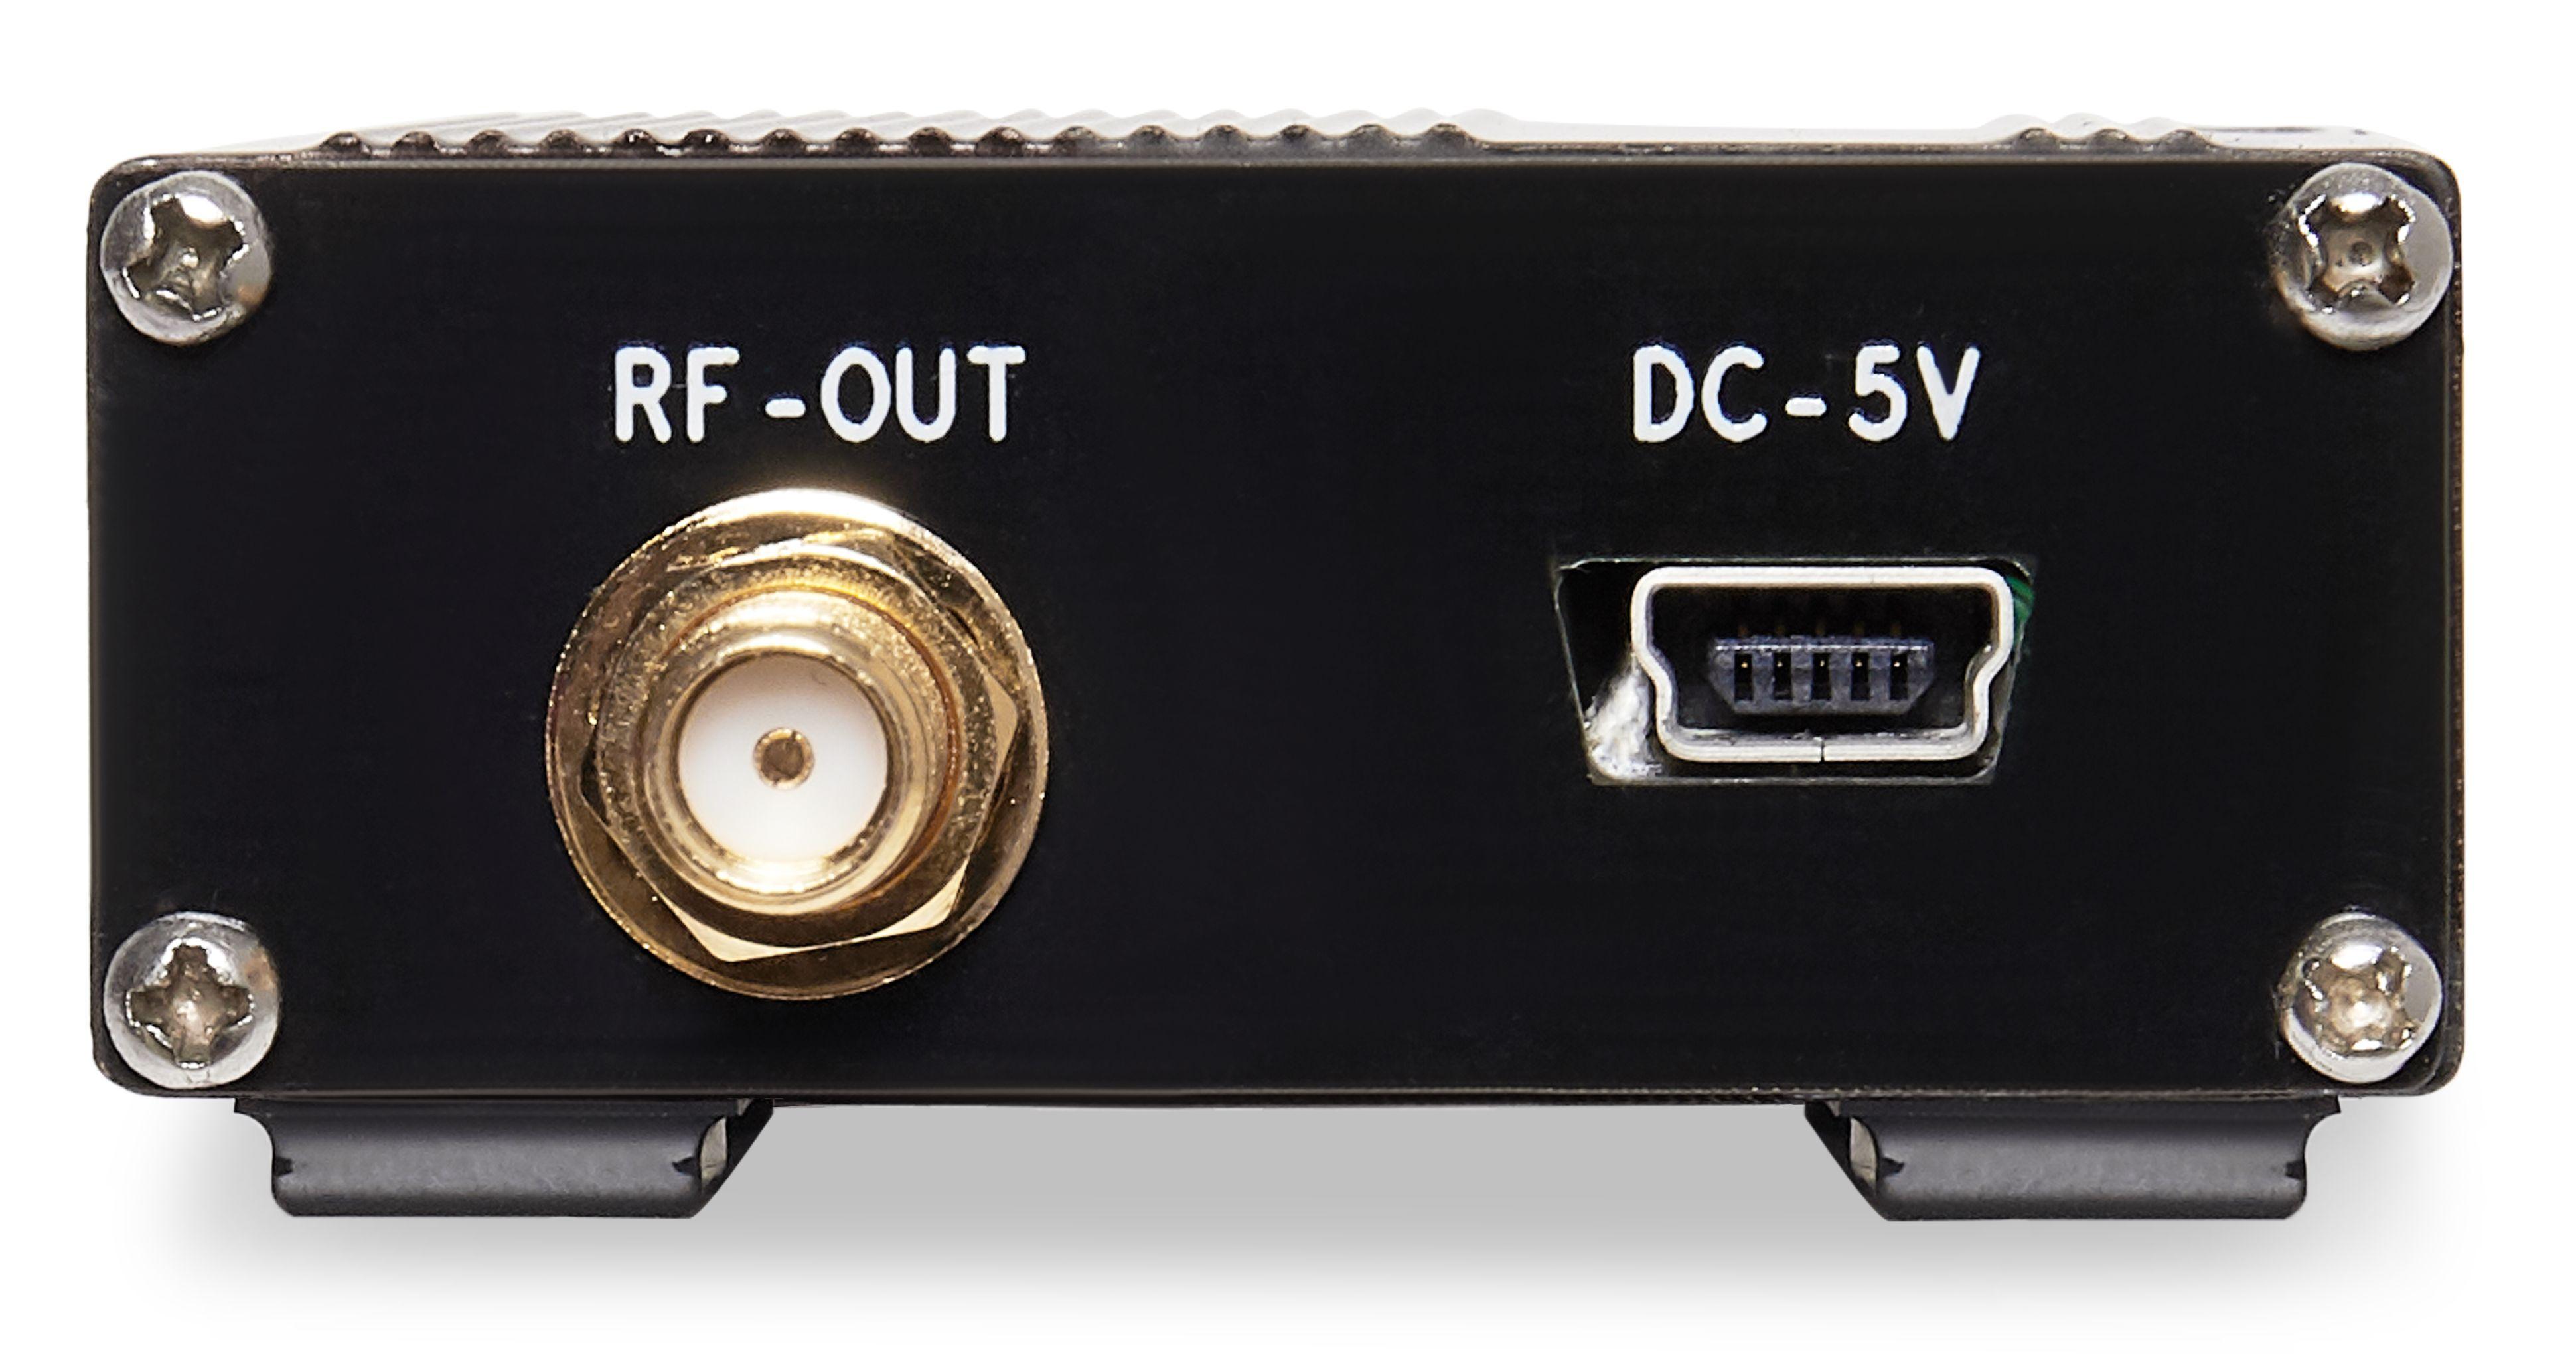 RF wideband power amplifier 1MHz-2GHz gain 40dB output 20dBm